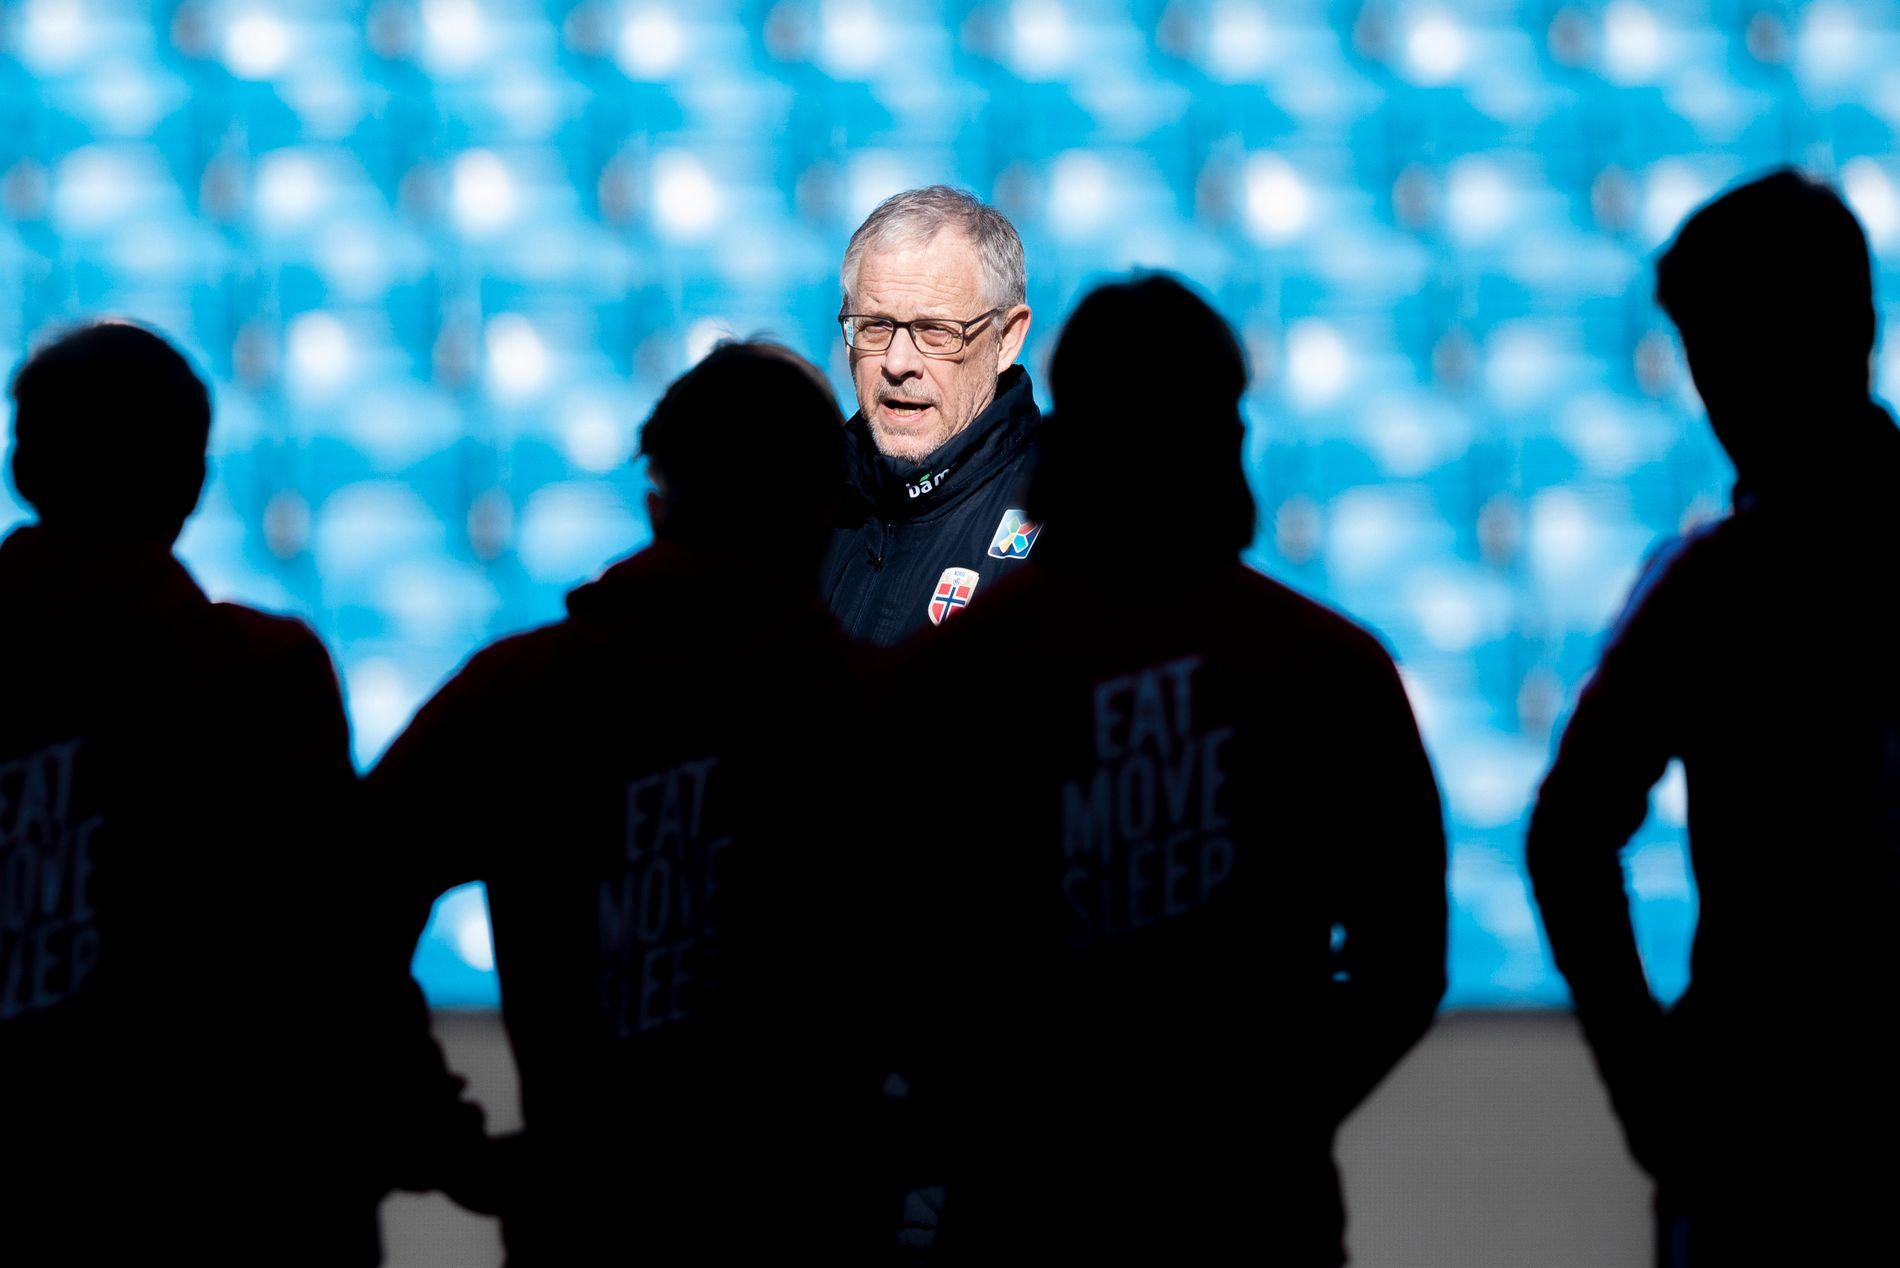 VIL SNU TRENDEN: Lars Lagerbäck forberedte landslaget i sol til Australia-kampen, men Norges resultater har befunnet seg på skyggesiden i svenskens første år.